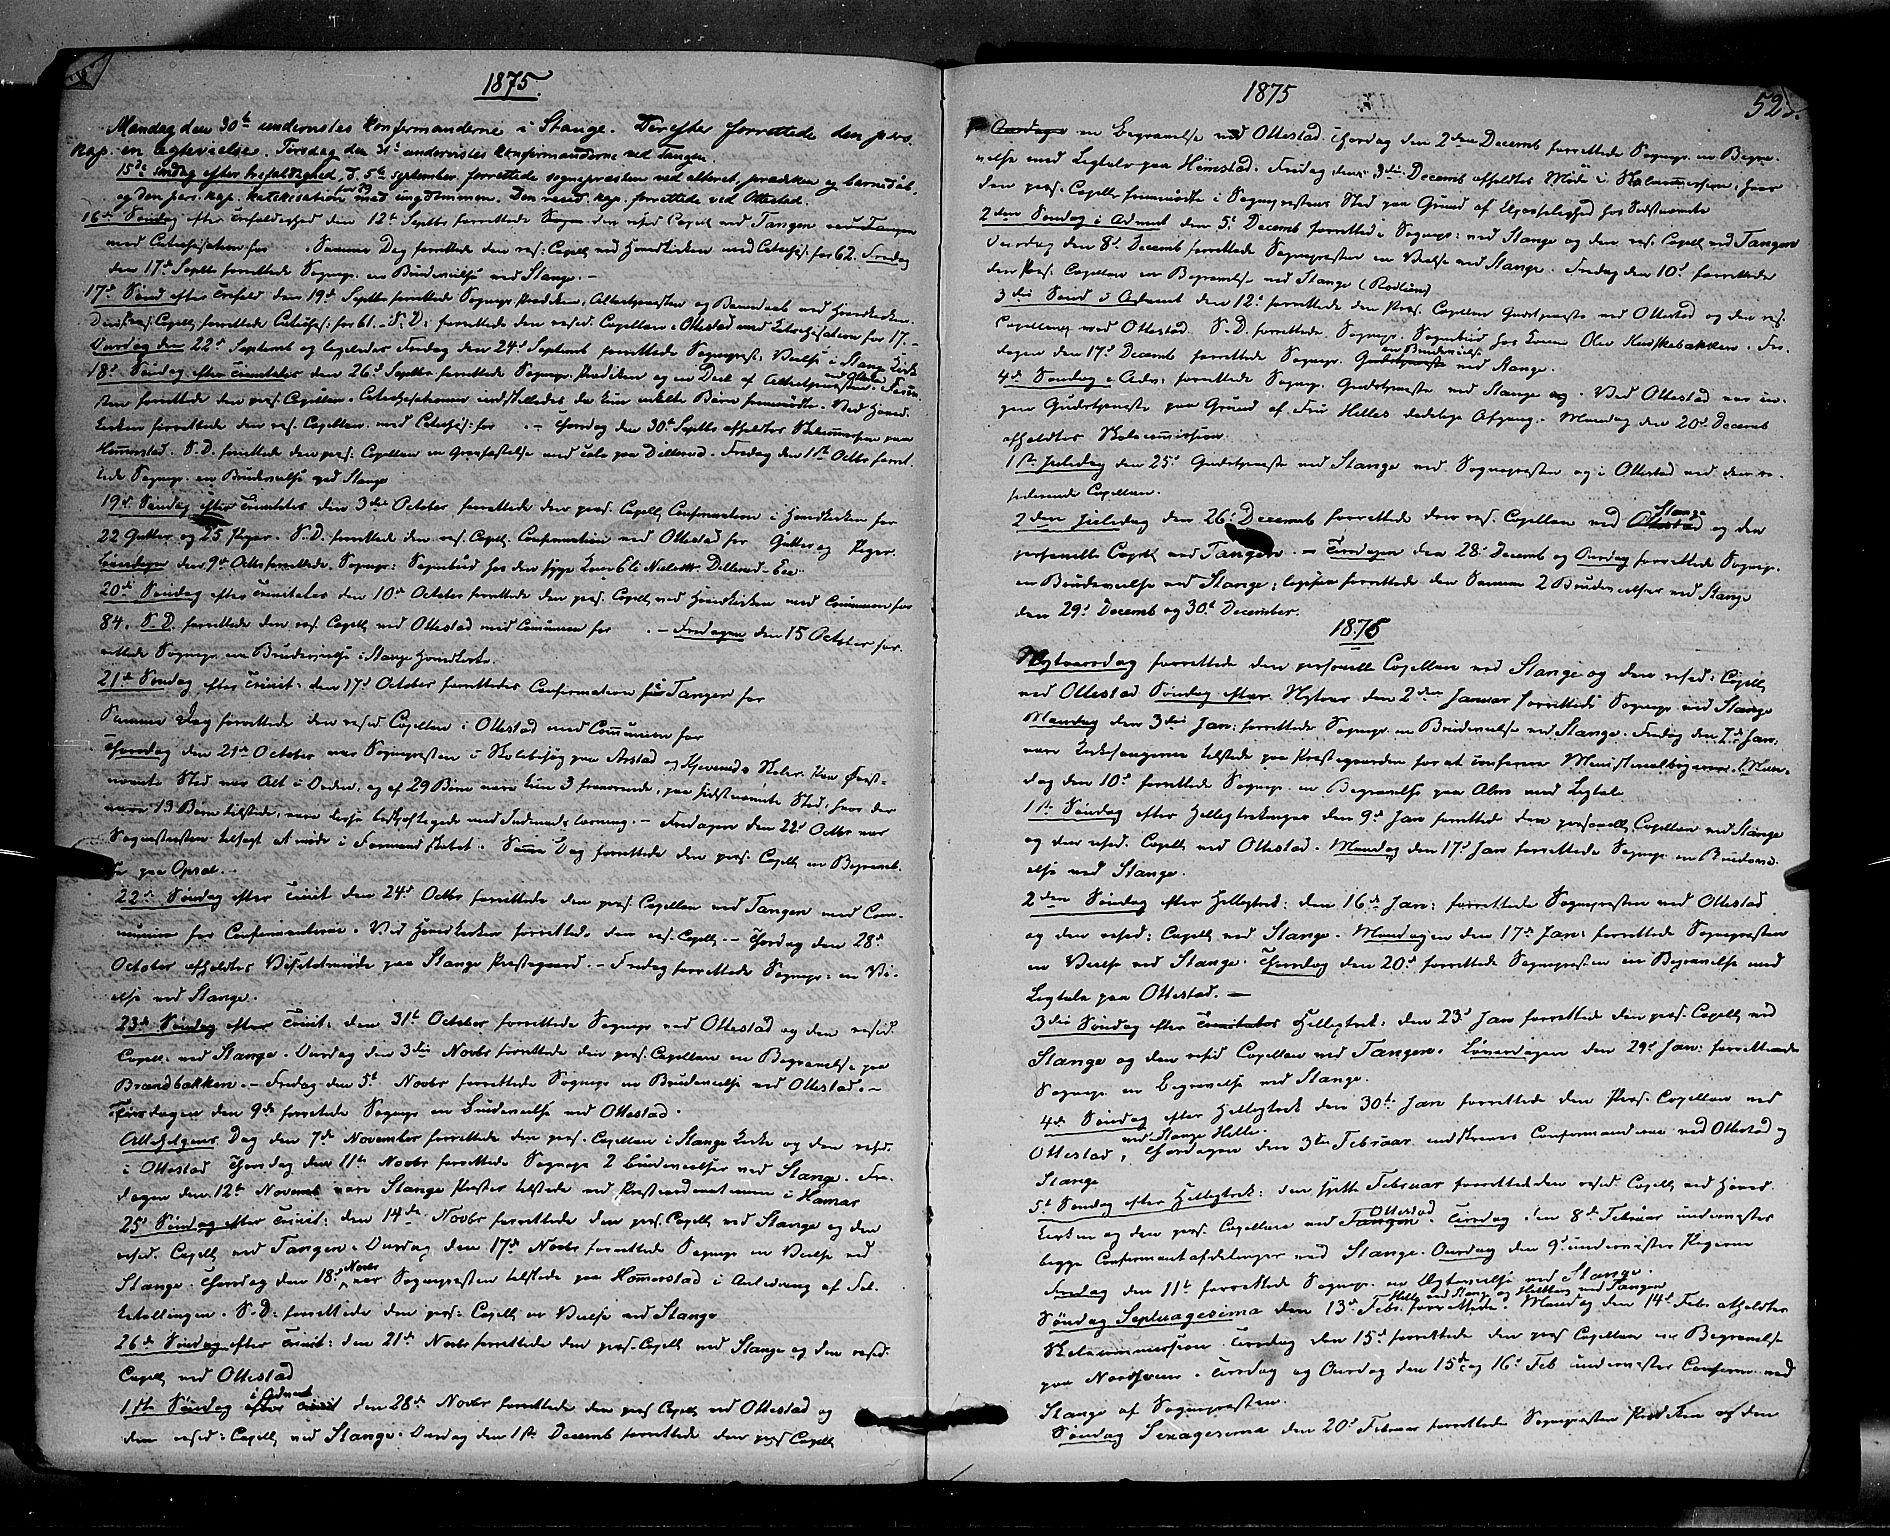 SAH, Stange prestekontor, K/L0013: Ministerialbok nr. 13, 1862-1879, s. 523